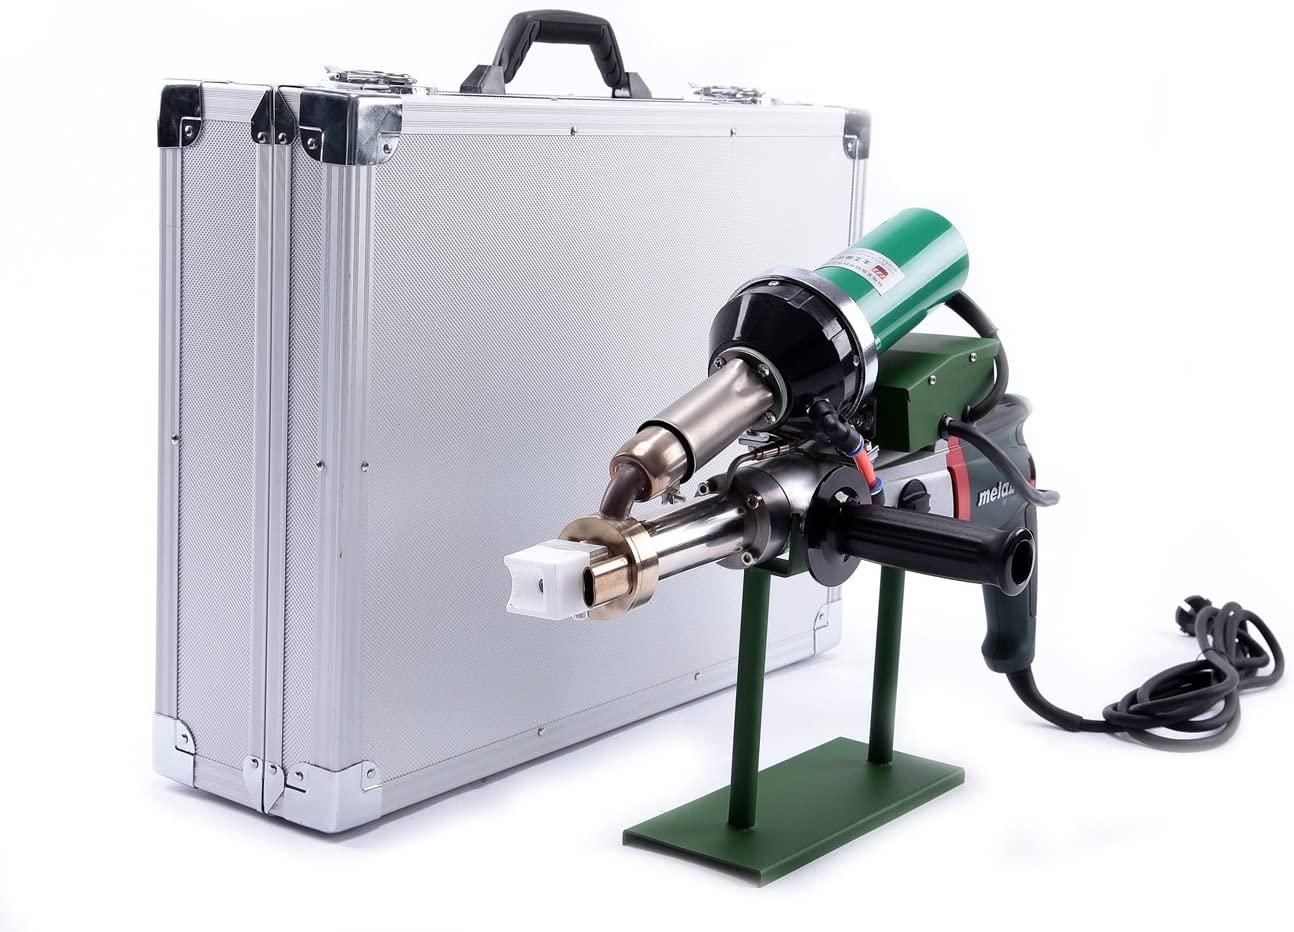 2014 Hot Sale High Frequency Hand-Held Hot Air Gun Hand Extruder PVC Pipe Welding Machine